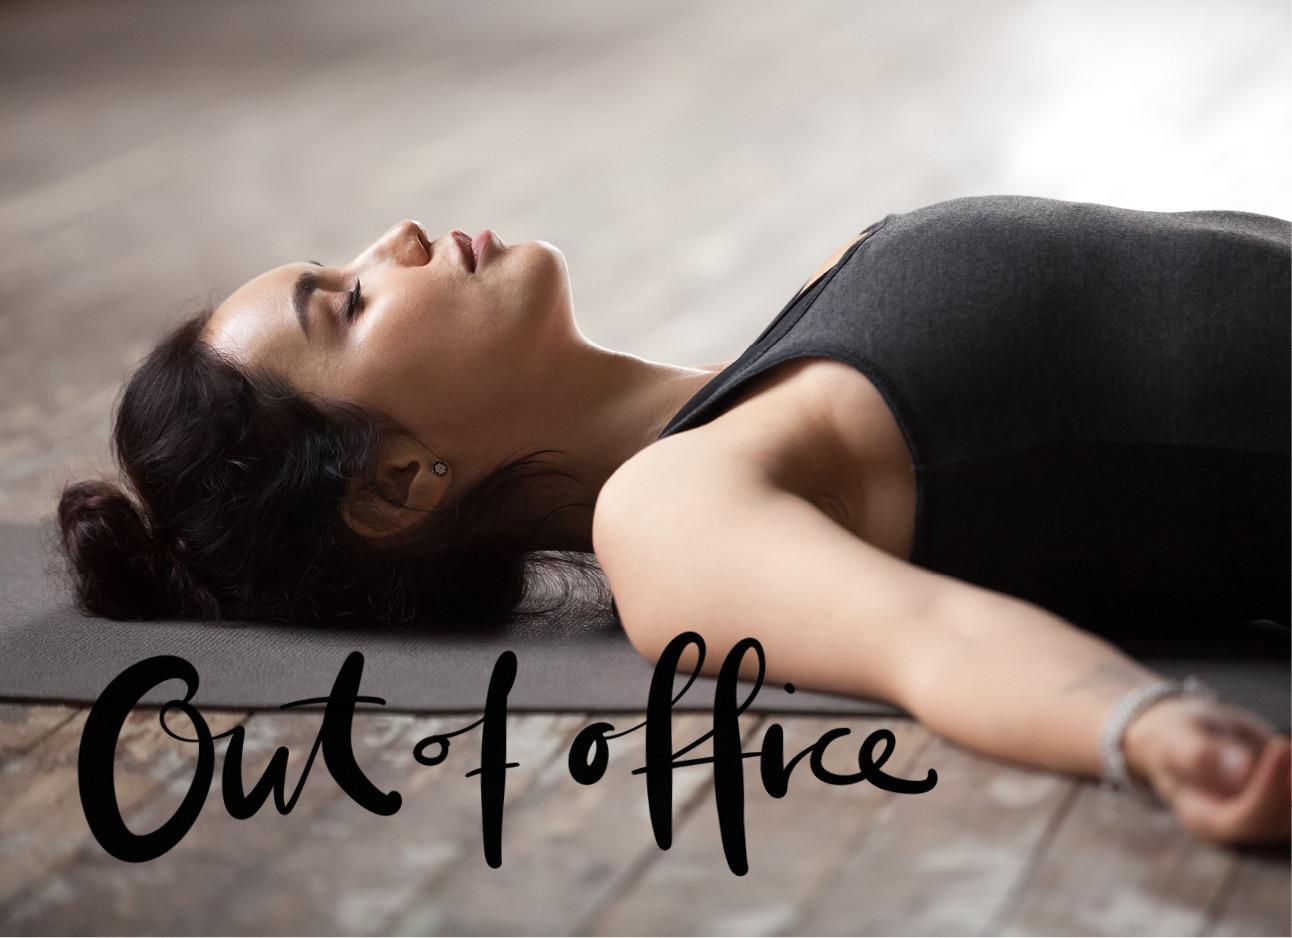 vrouw lachend op een yoga mat bezig met Nindra yoga